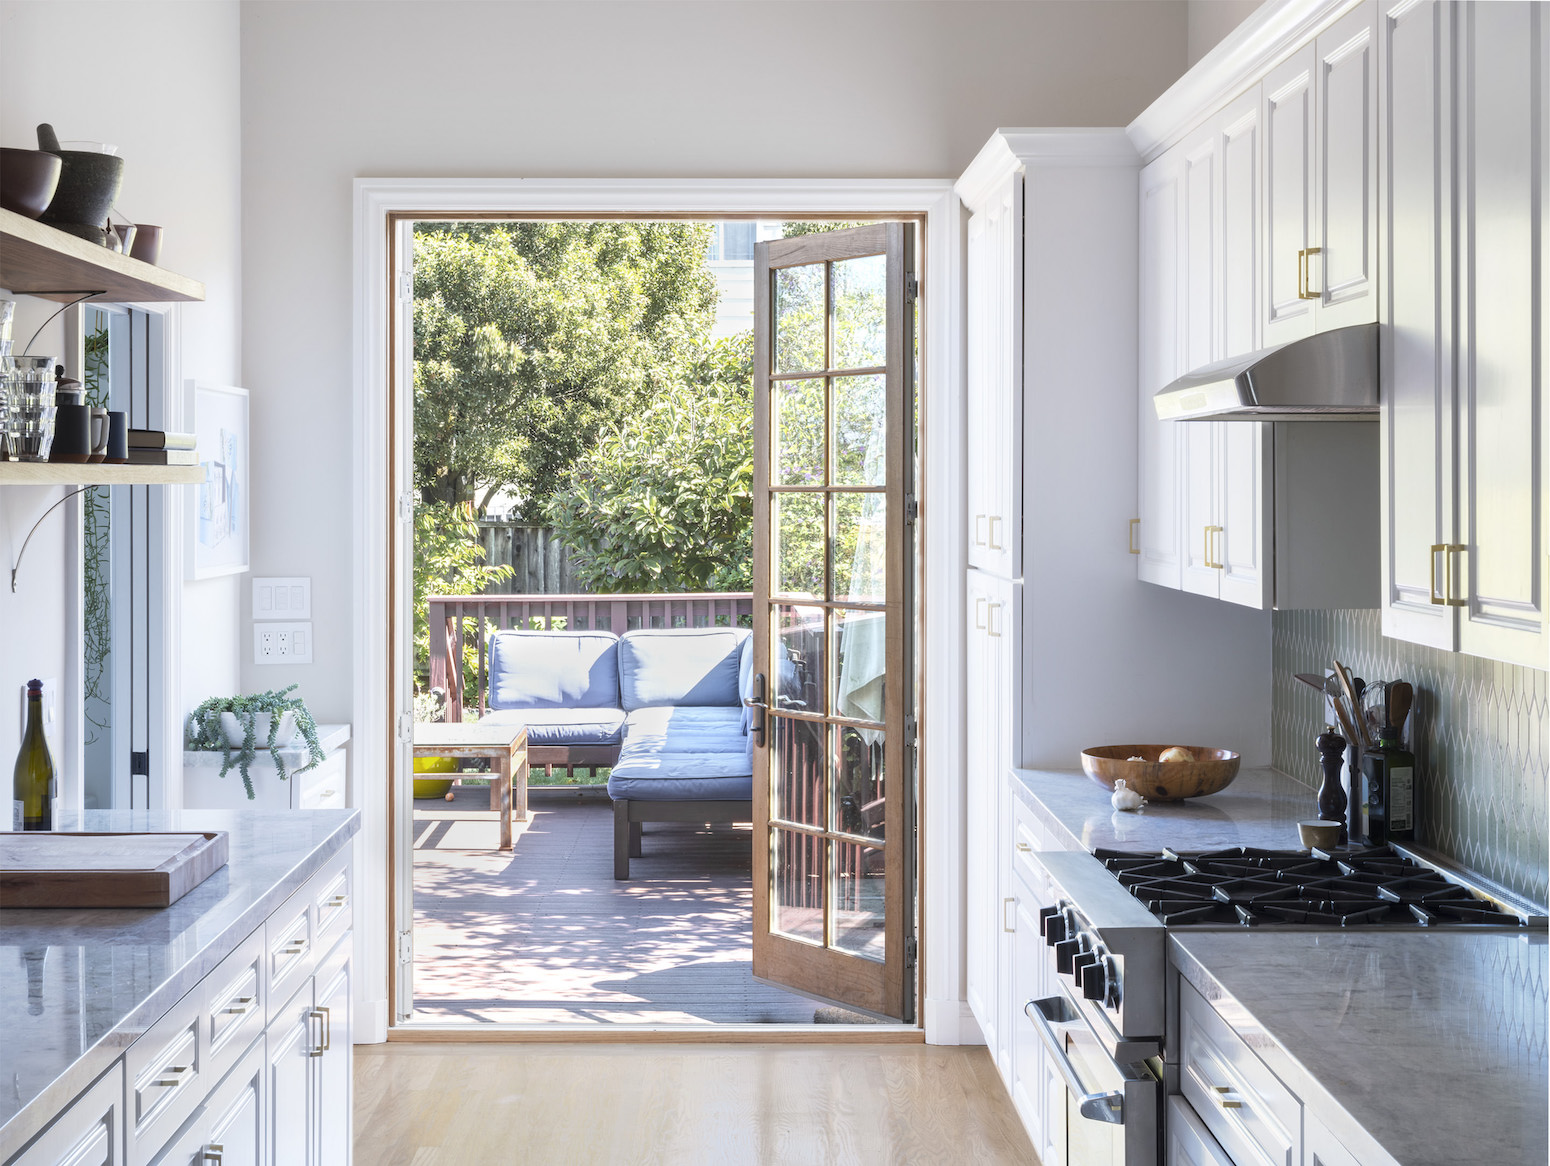 Remodeled Kitchen + Deck